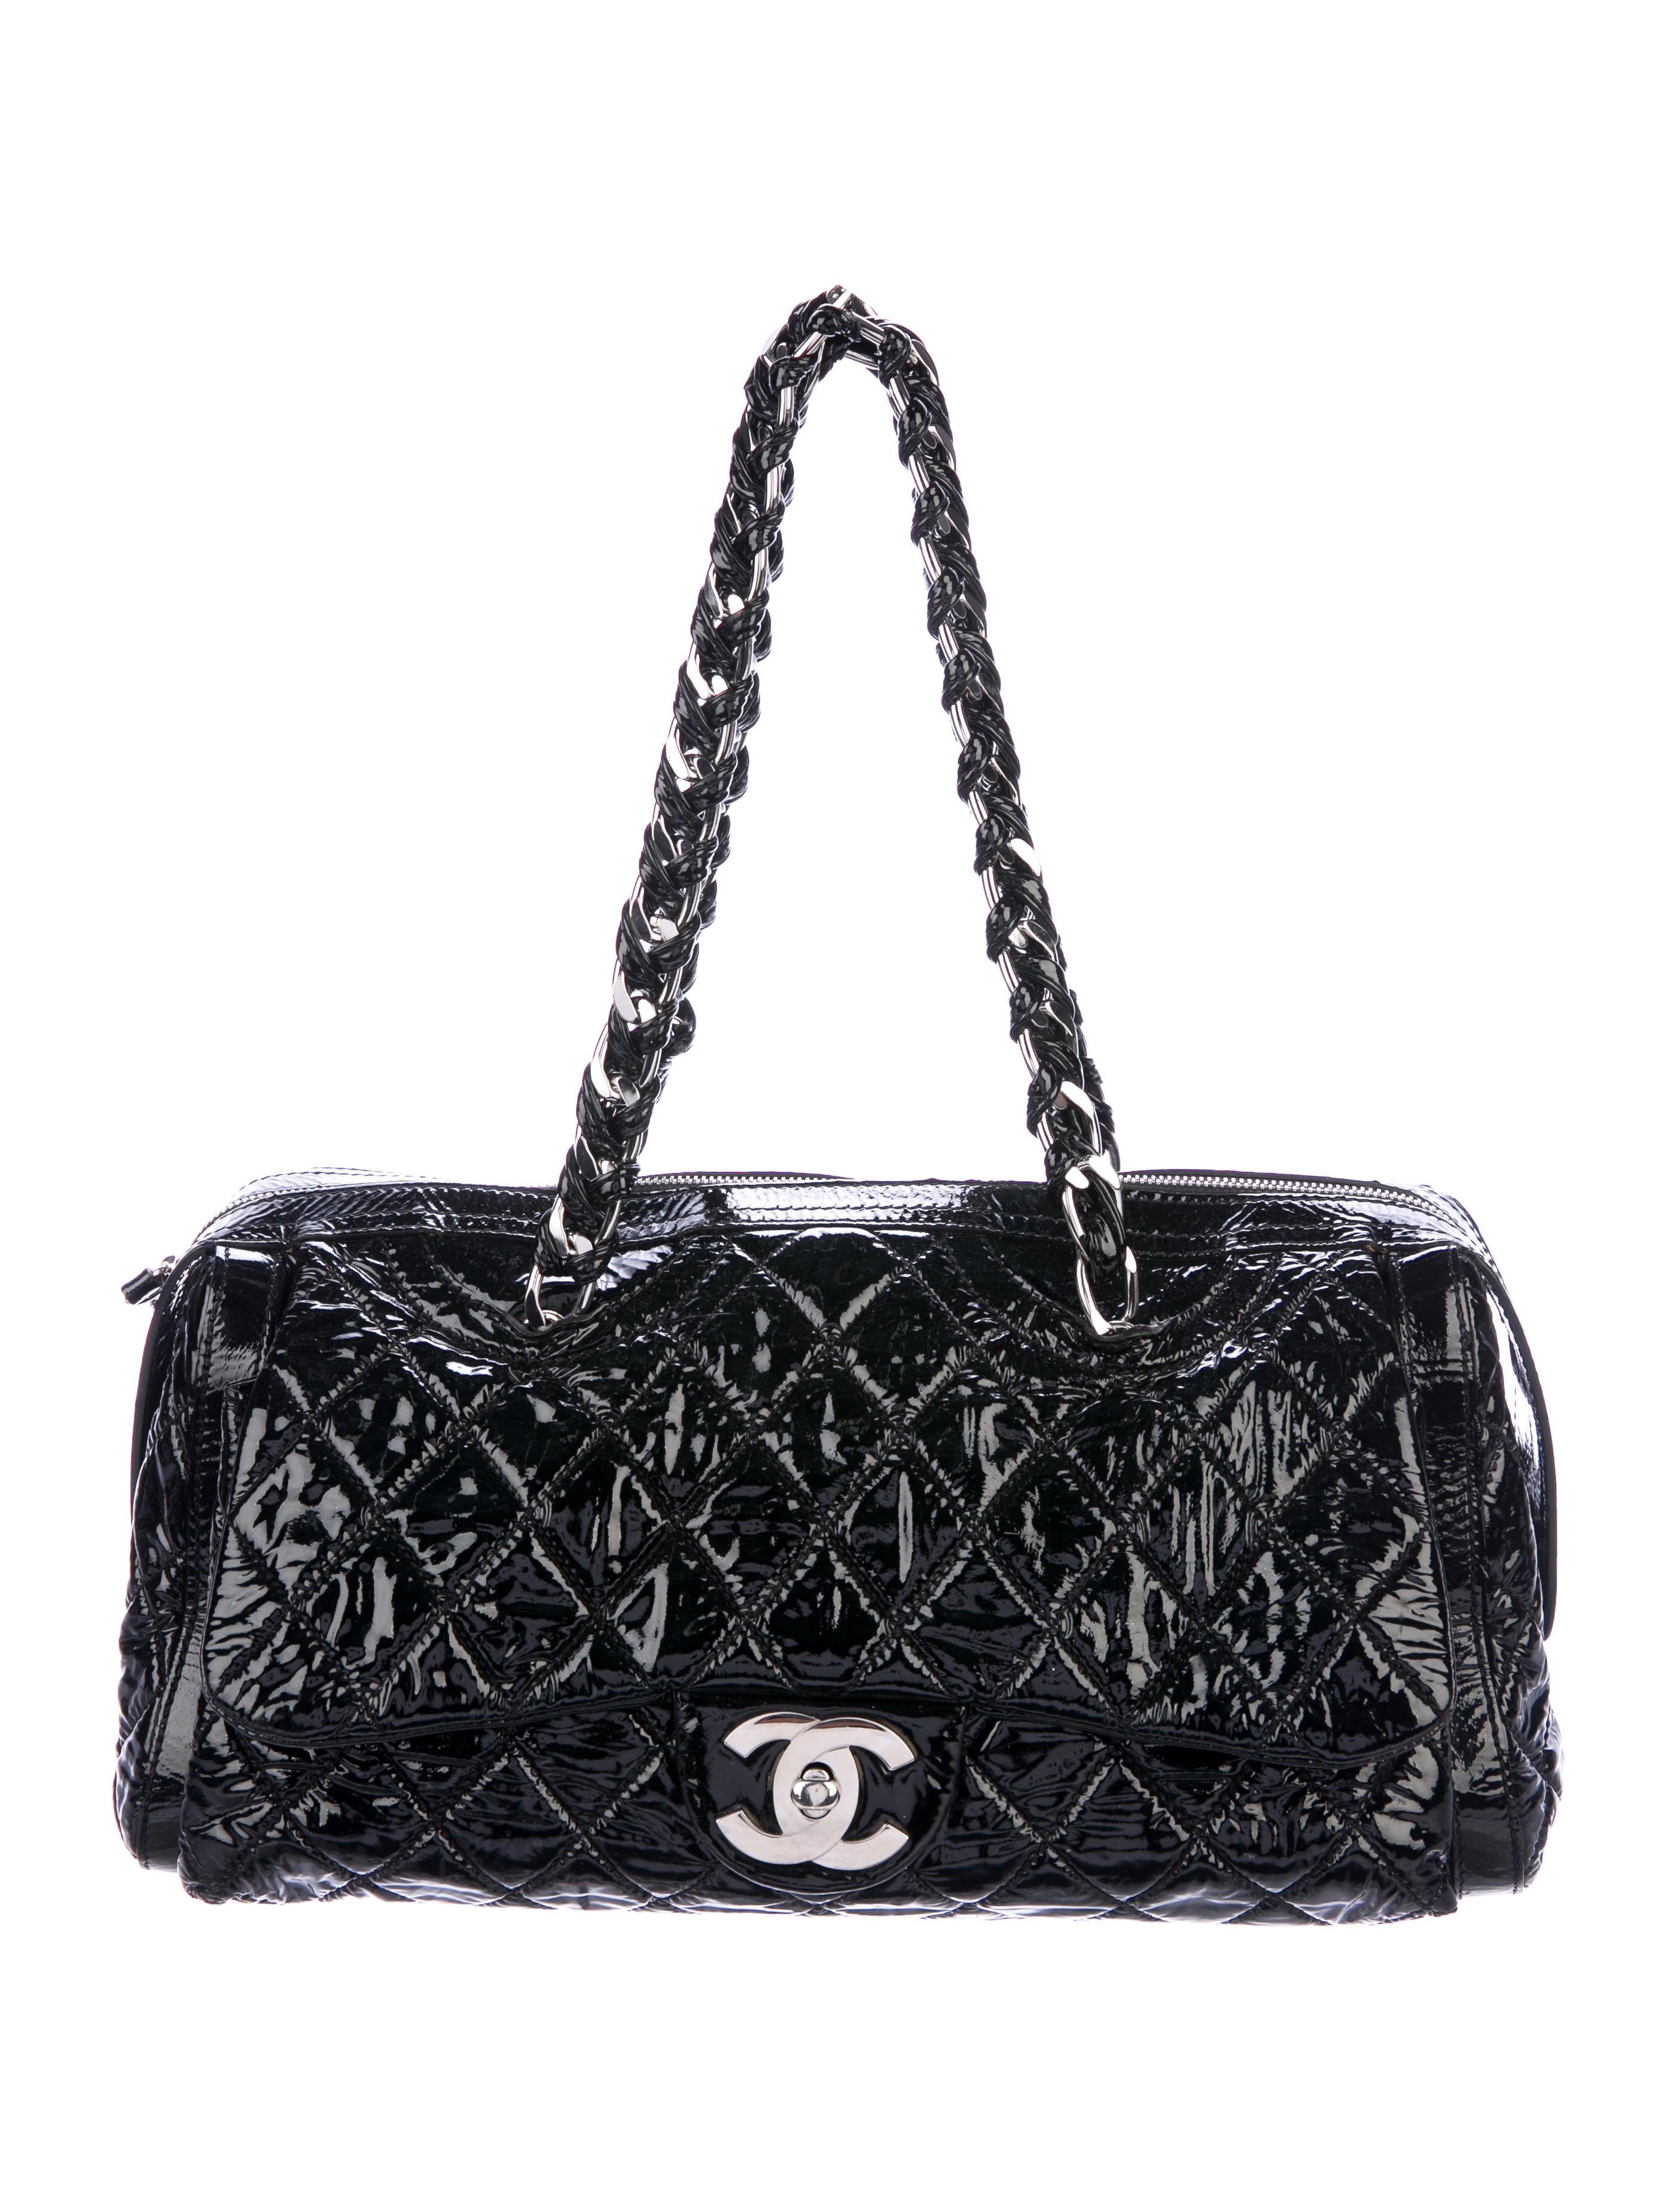 2705d88a7c6 Chanel Modern Chain Day Glow Camera Bag - Handbags - CHA255961